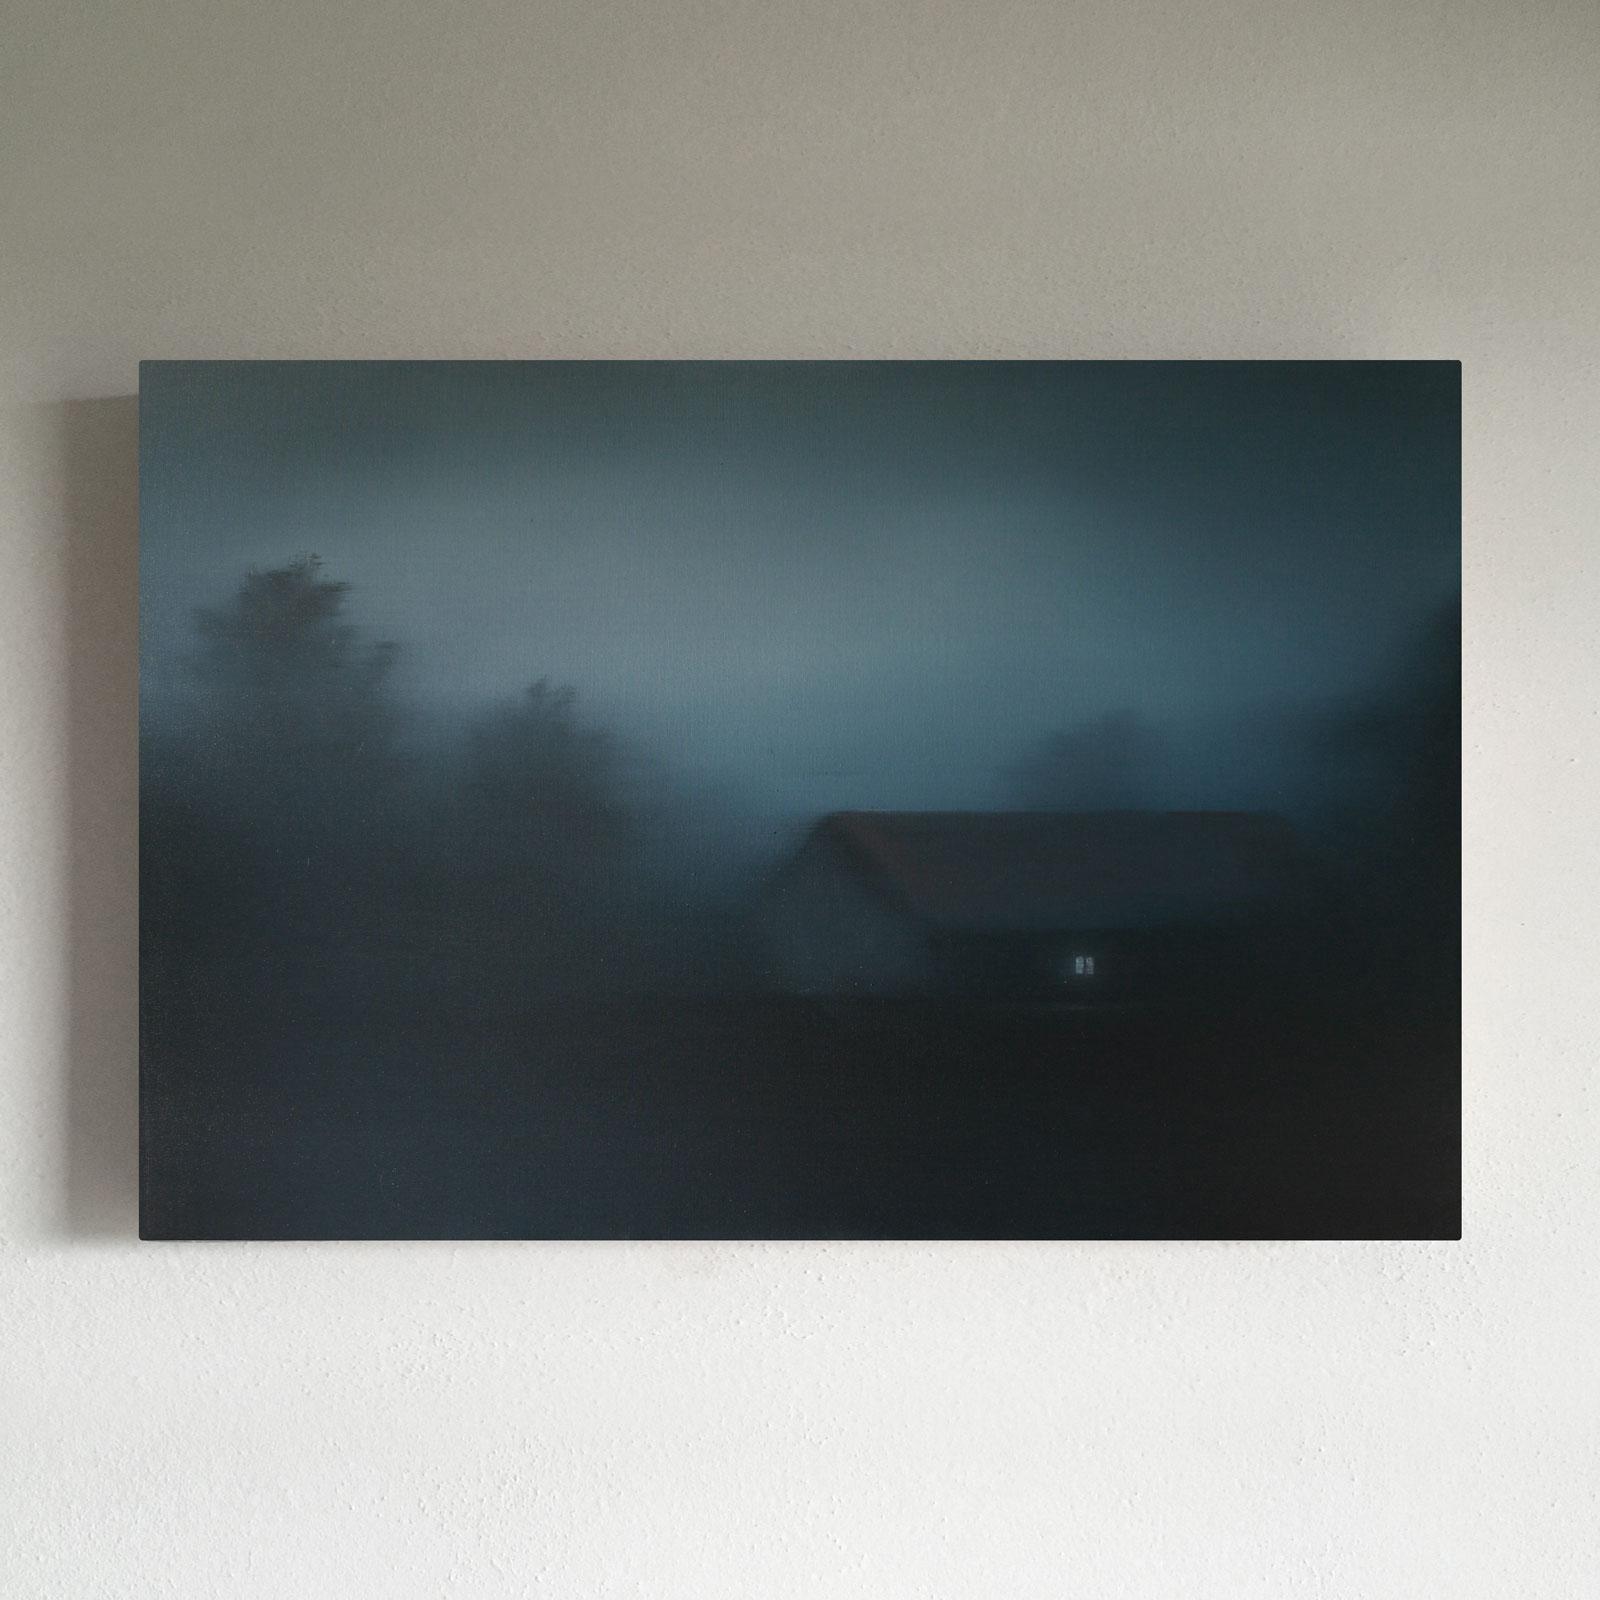 T#19-2009, oil on canvas, 80x120cm, priv. coll.